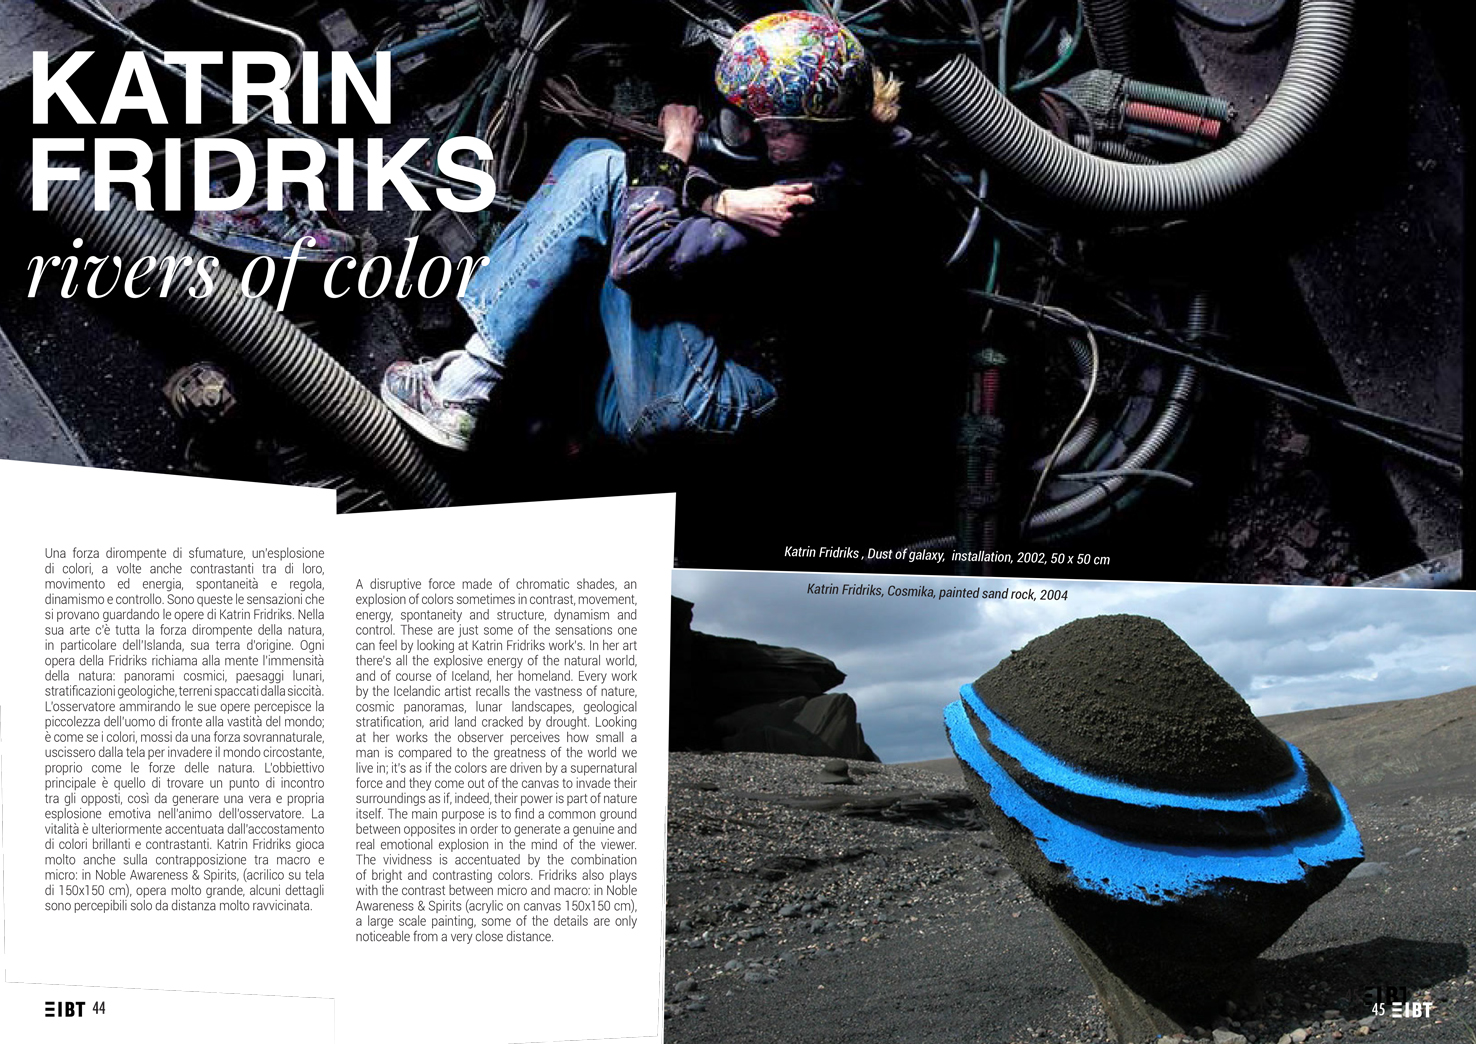 katrin fridriks- news agosto 2018